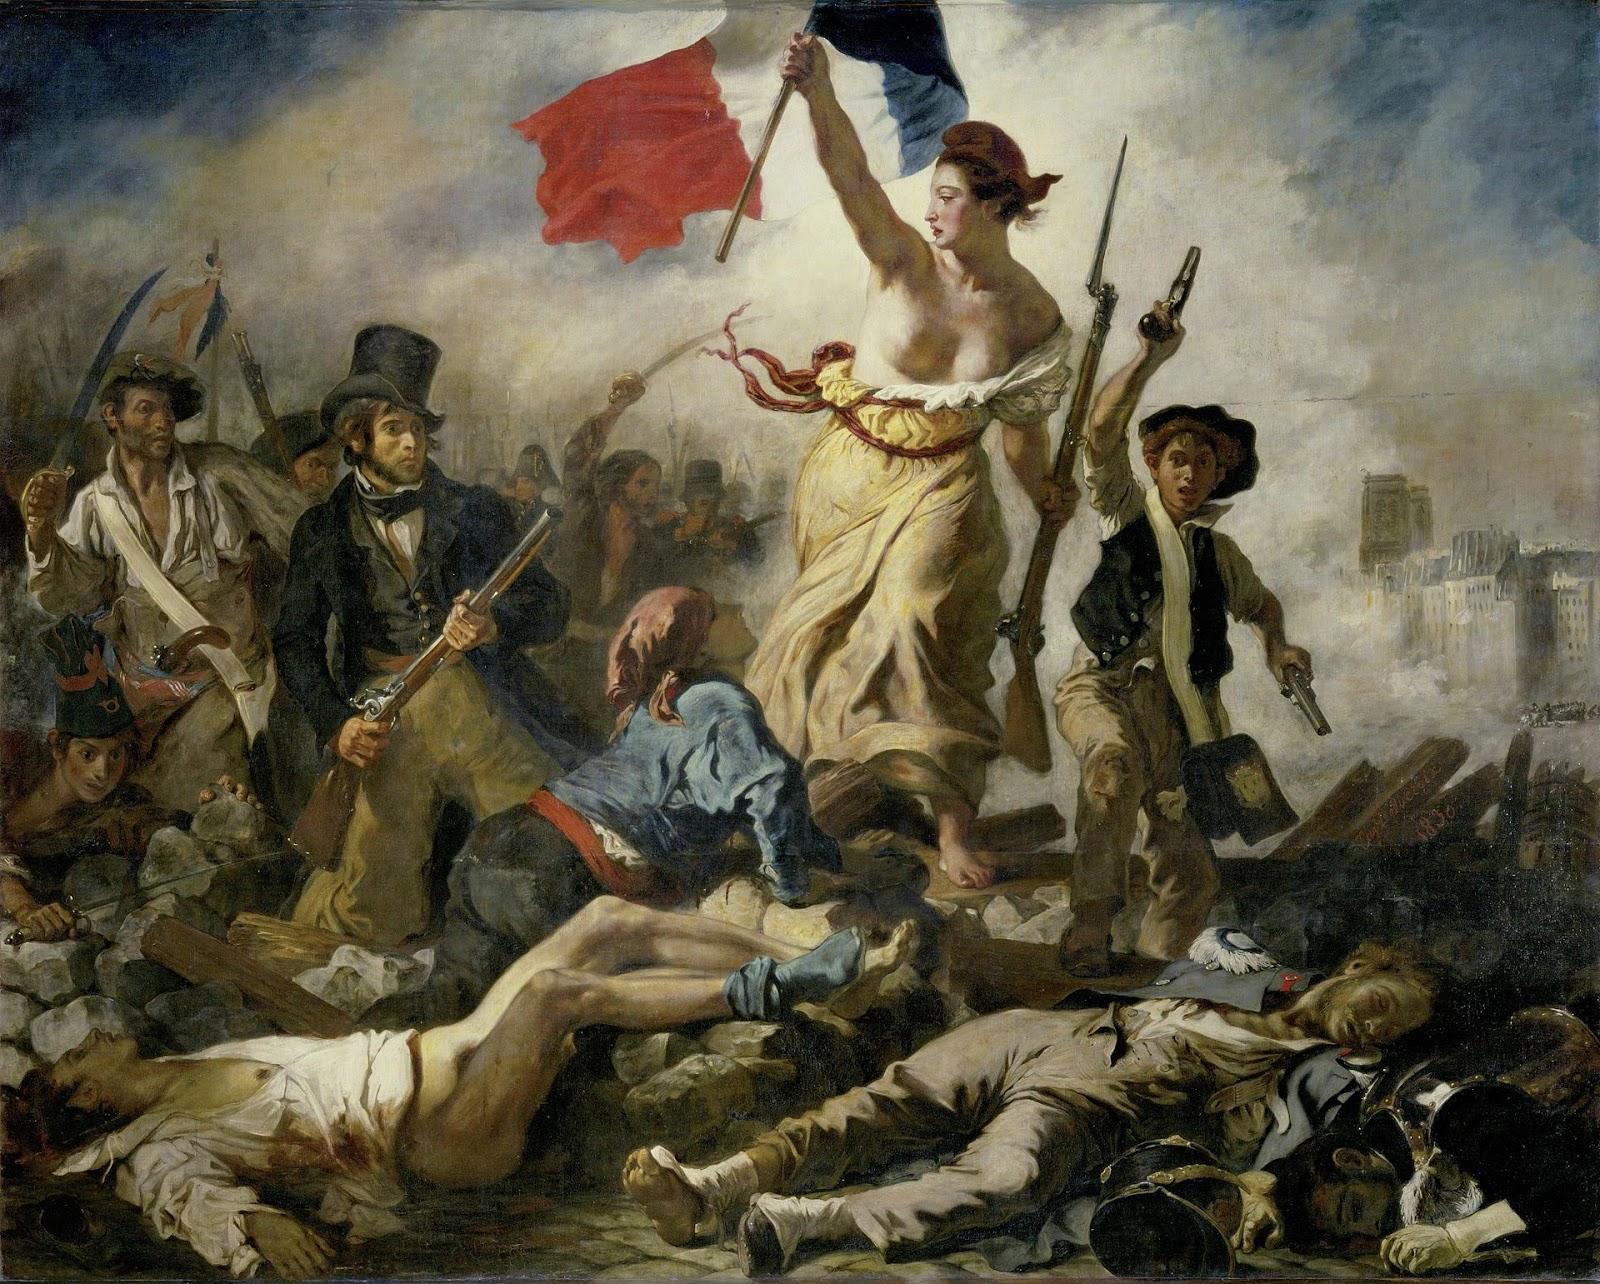 Eugene_Delacroix Libertyjpg